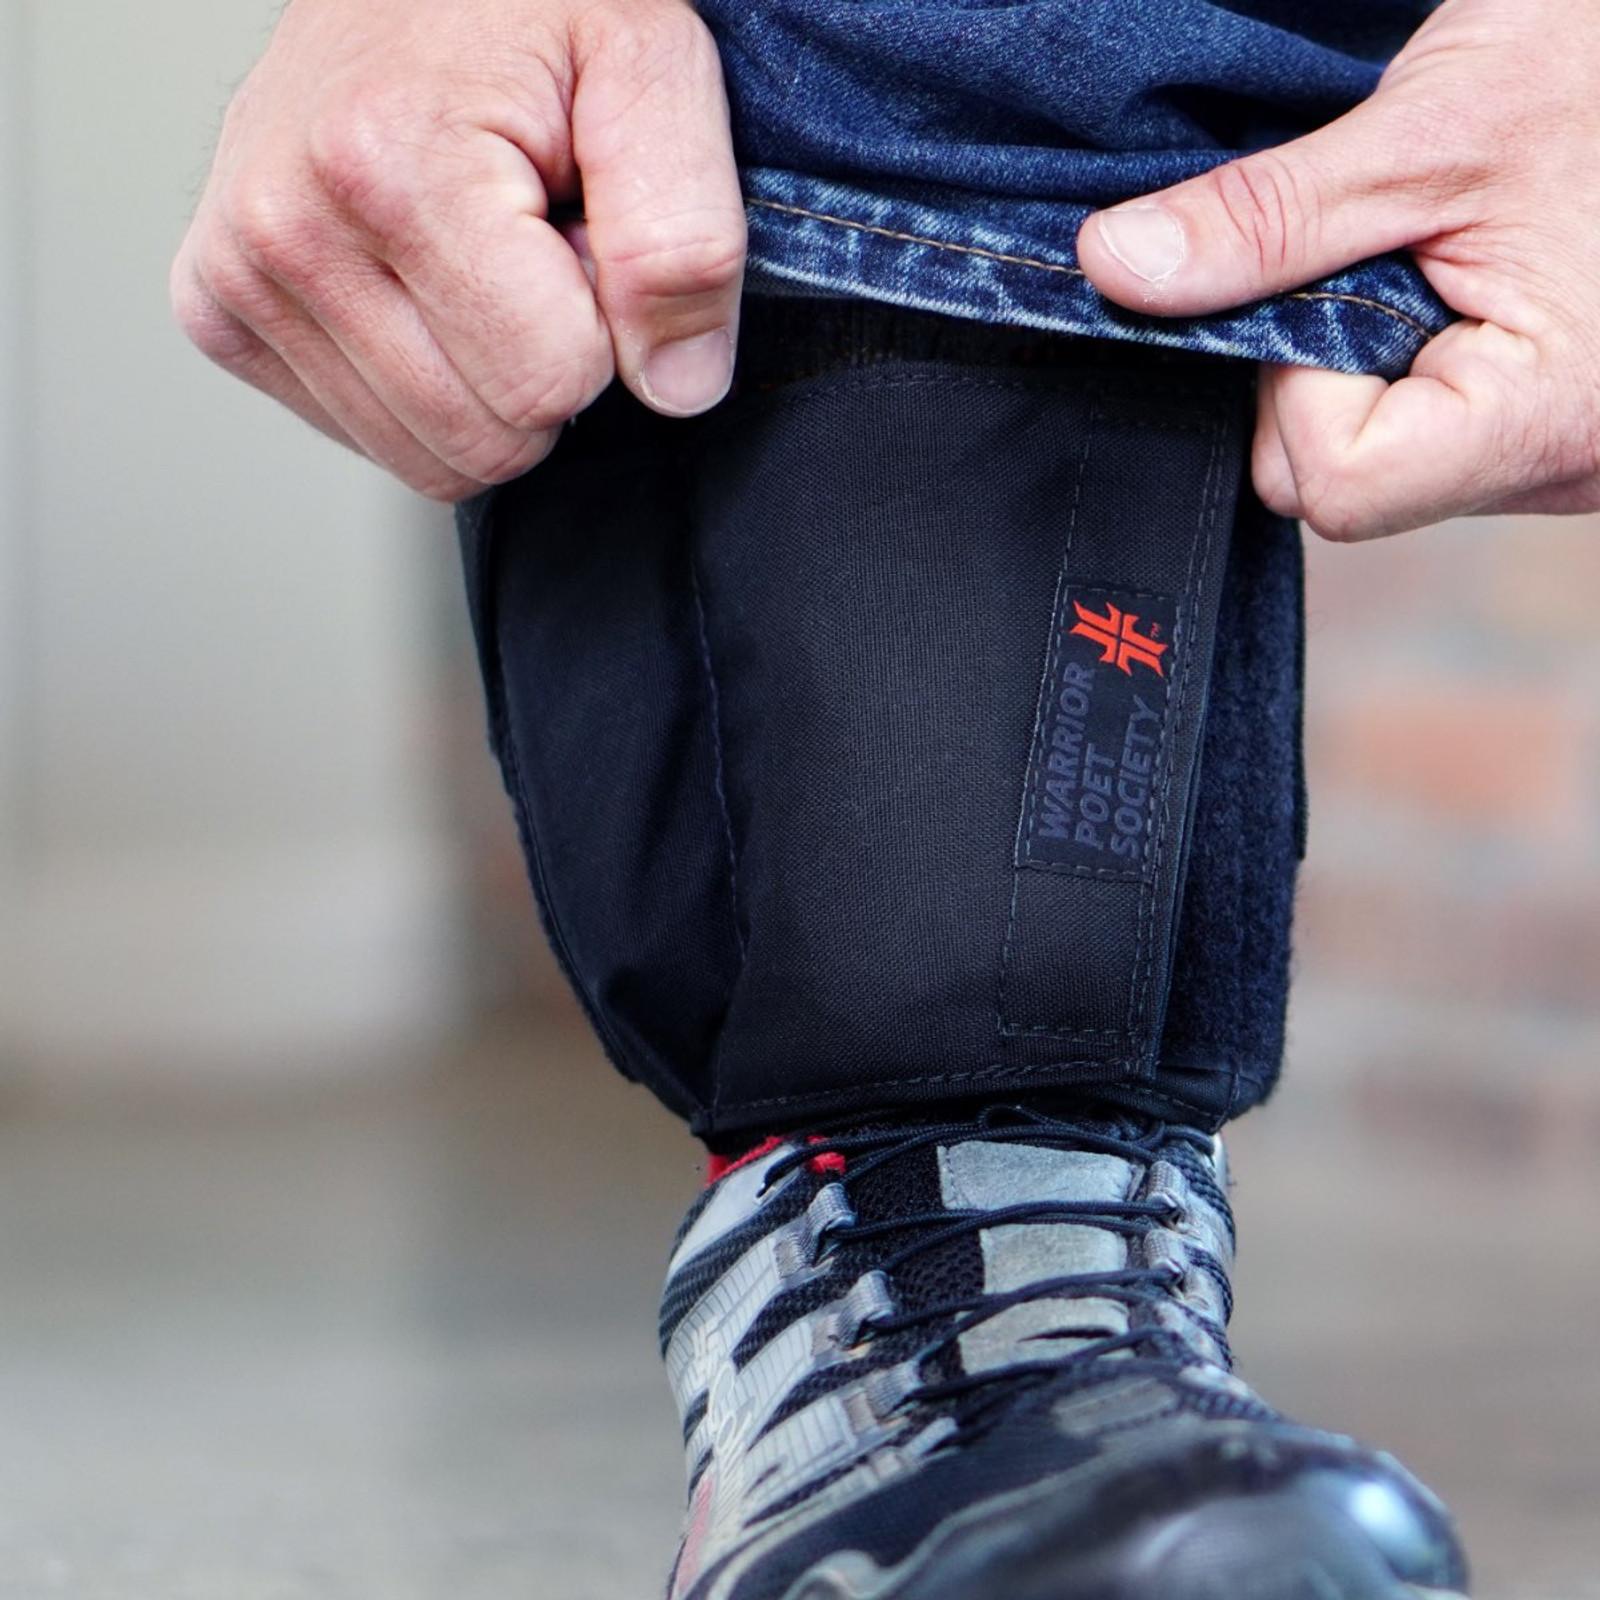 EDC Ankle Medical Kit + Medical Components Pack